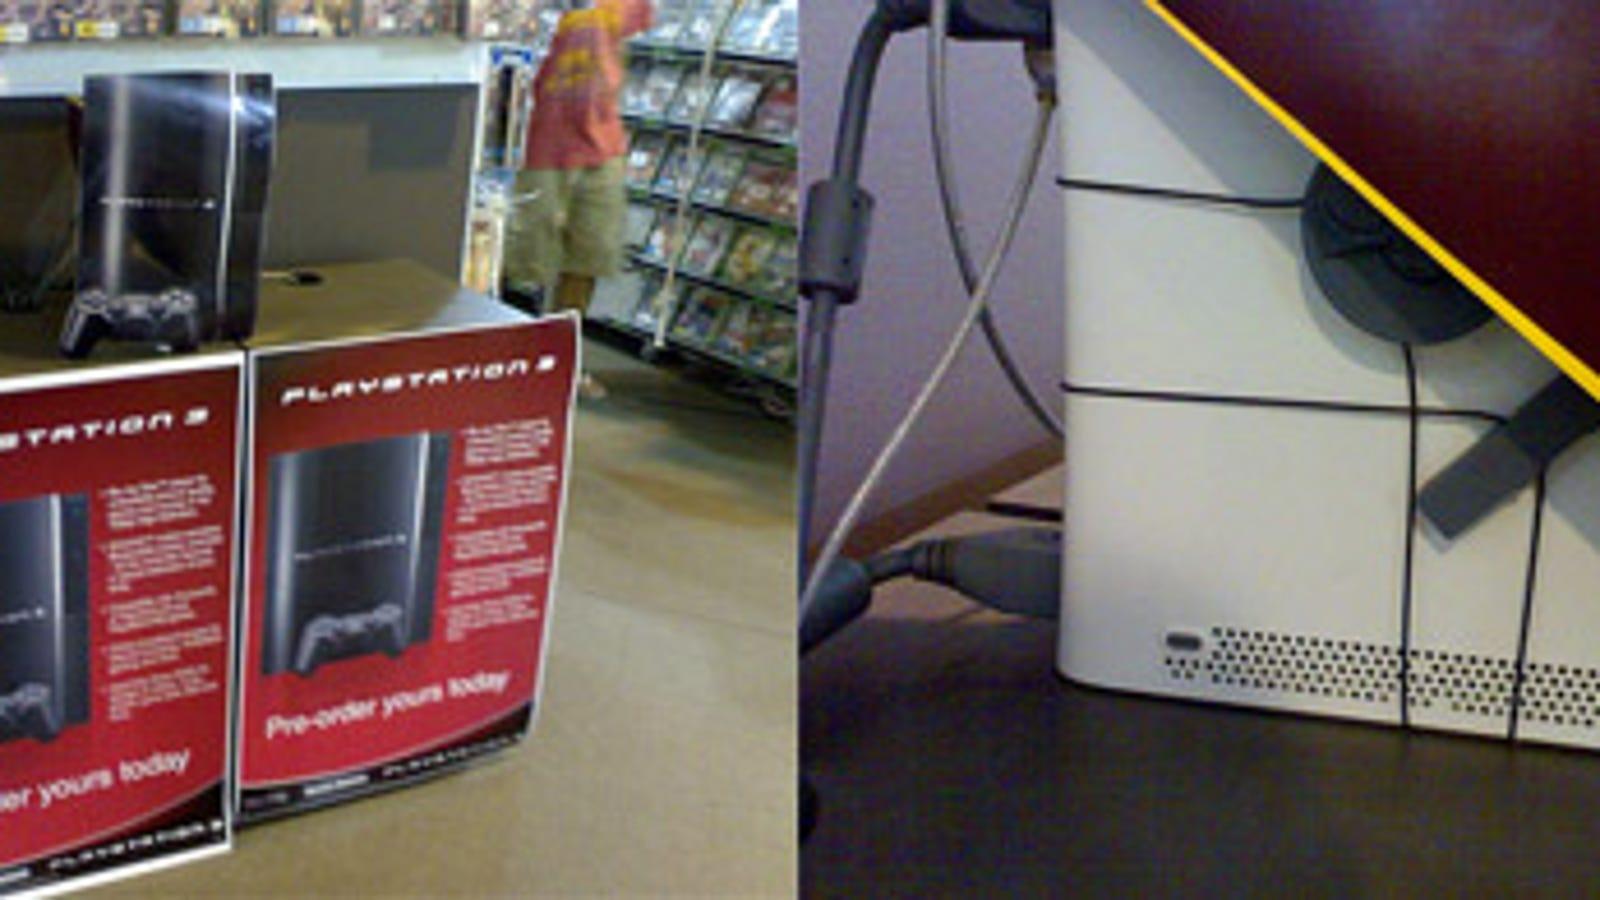 Australian Store Uses Xbox 360 As PS3 Kiosk